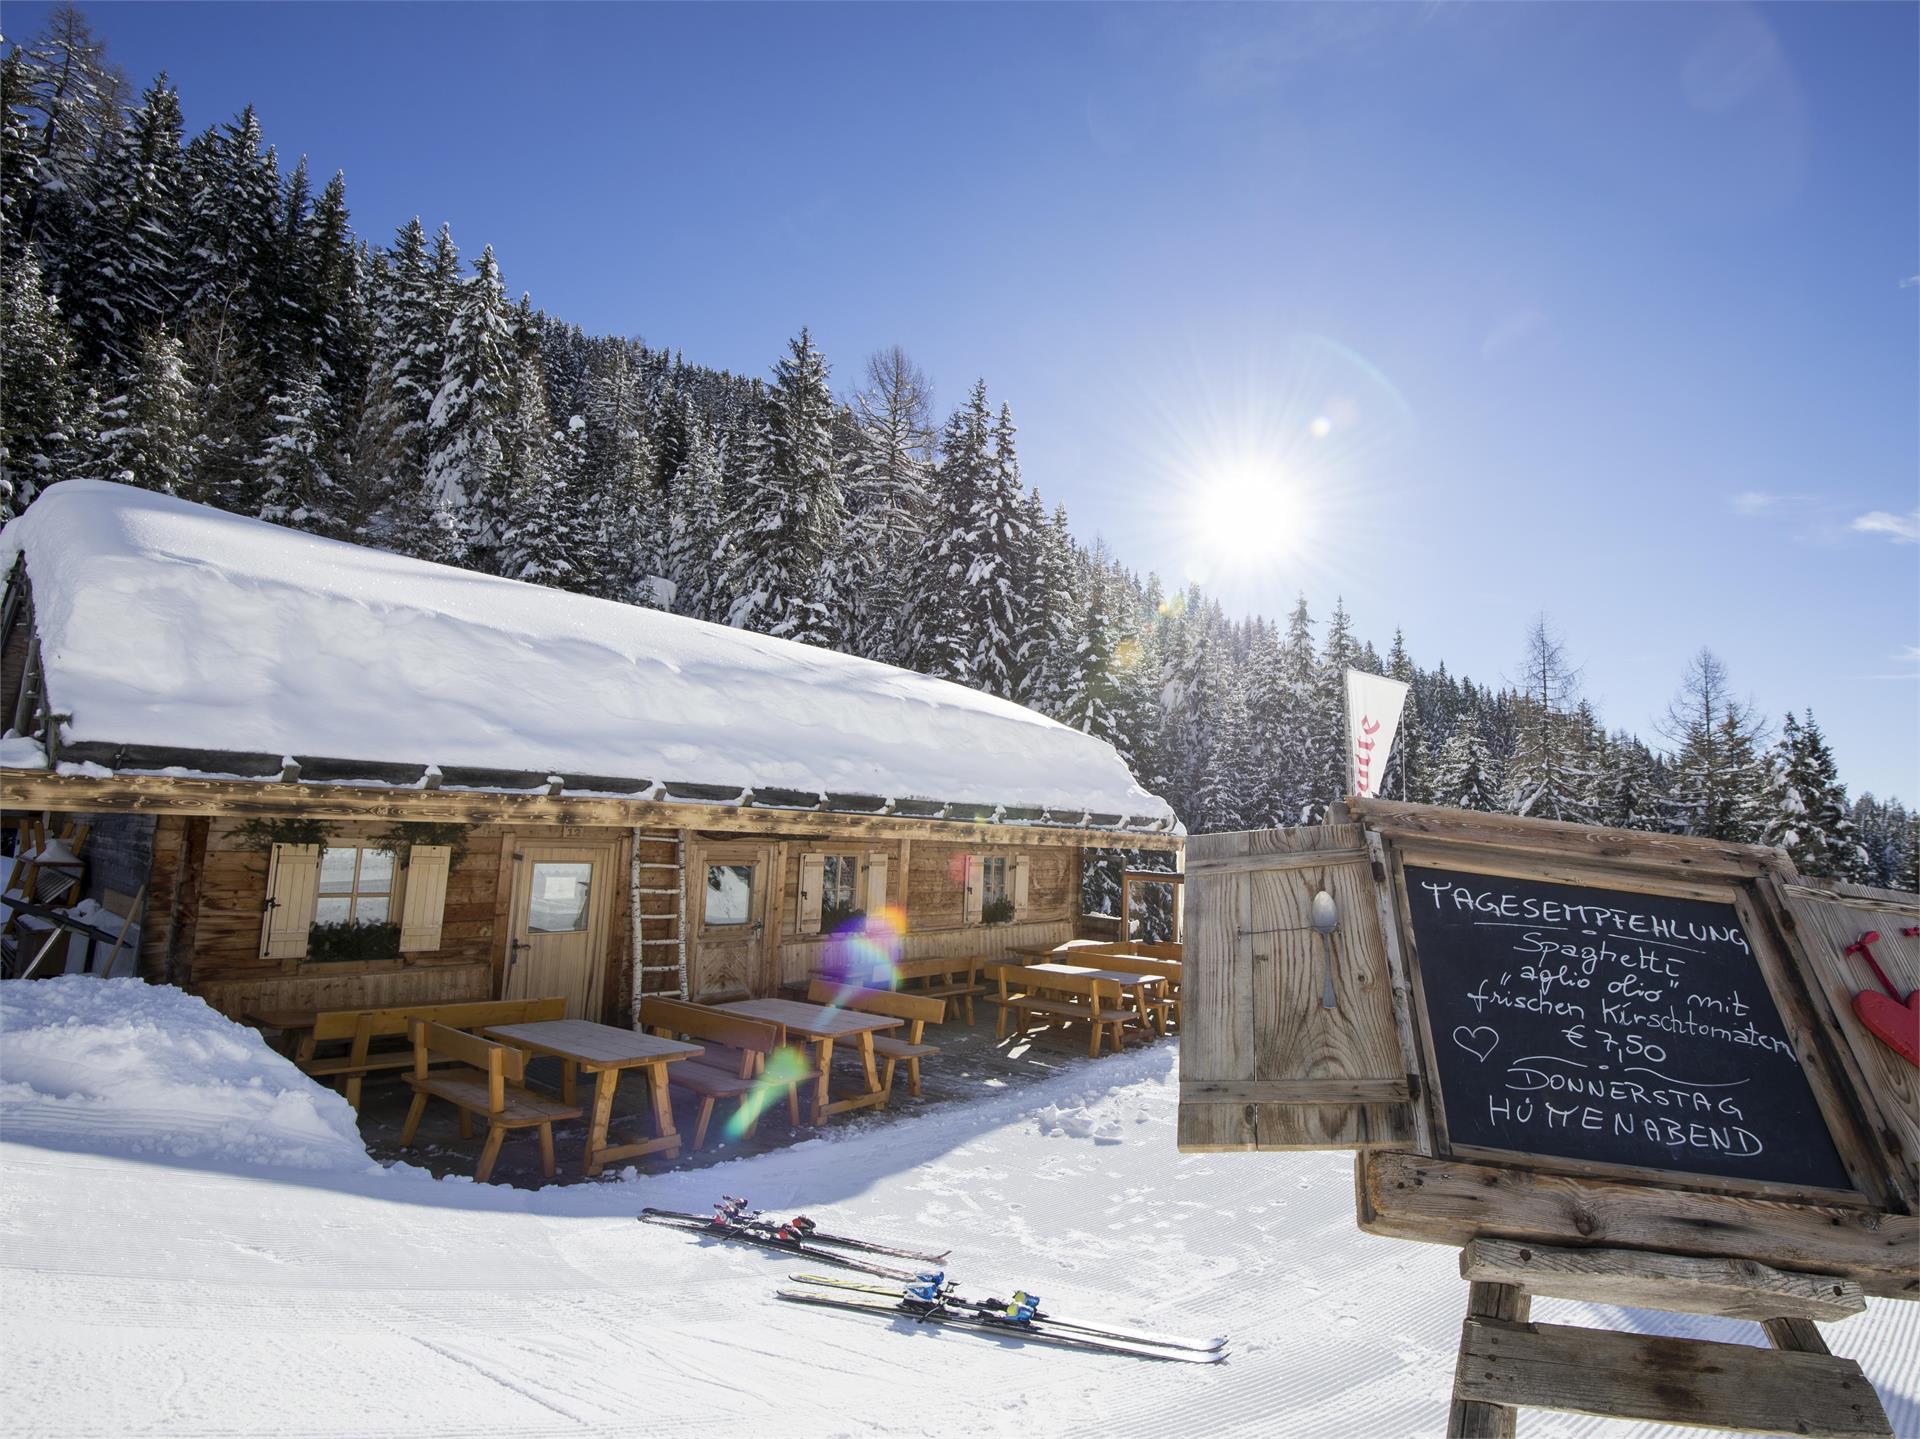 Winter hiking tour from Maranza/Meransen to the alpine lodge Bacherhütte